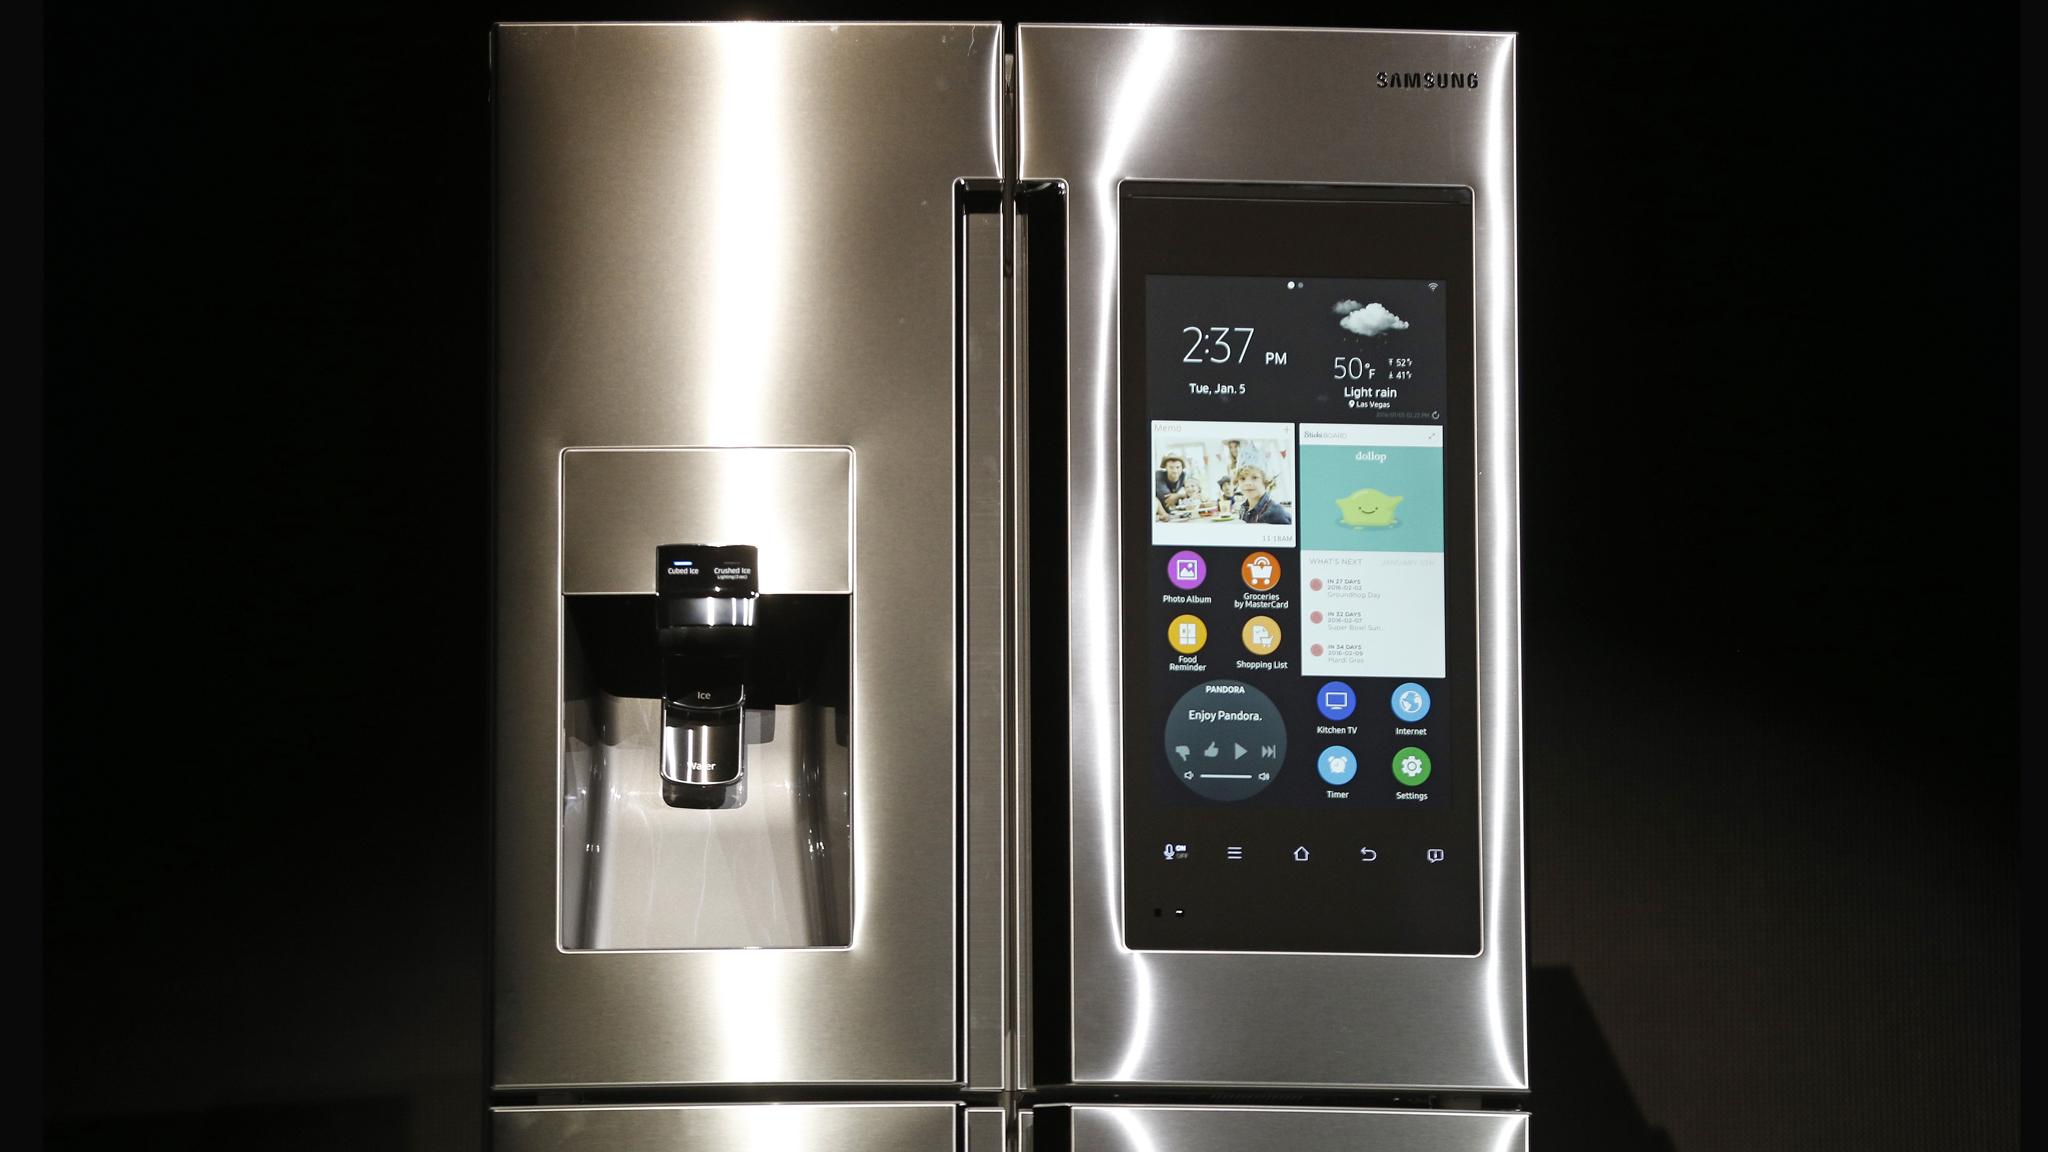 Samsung's selfie-taking fridge | Financial Times